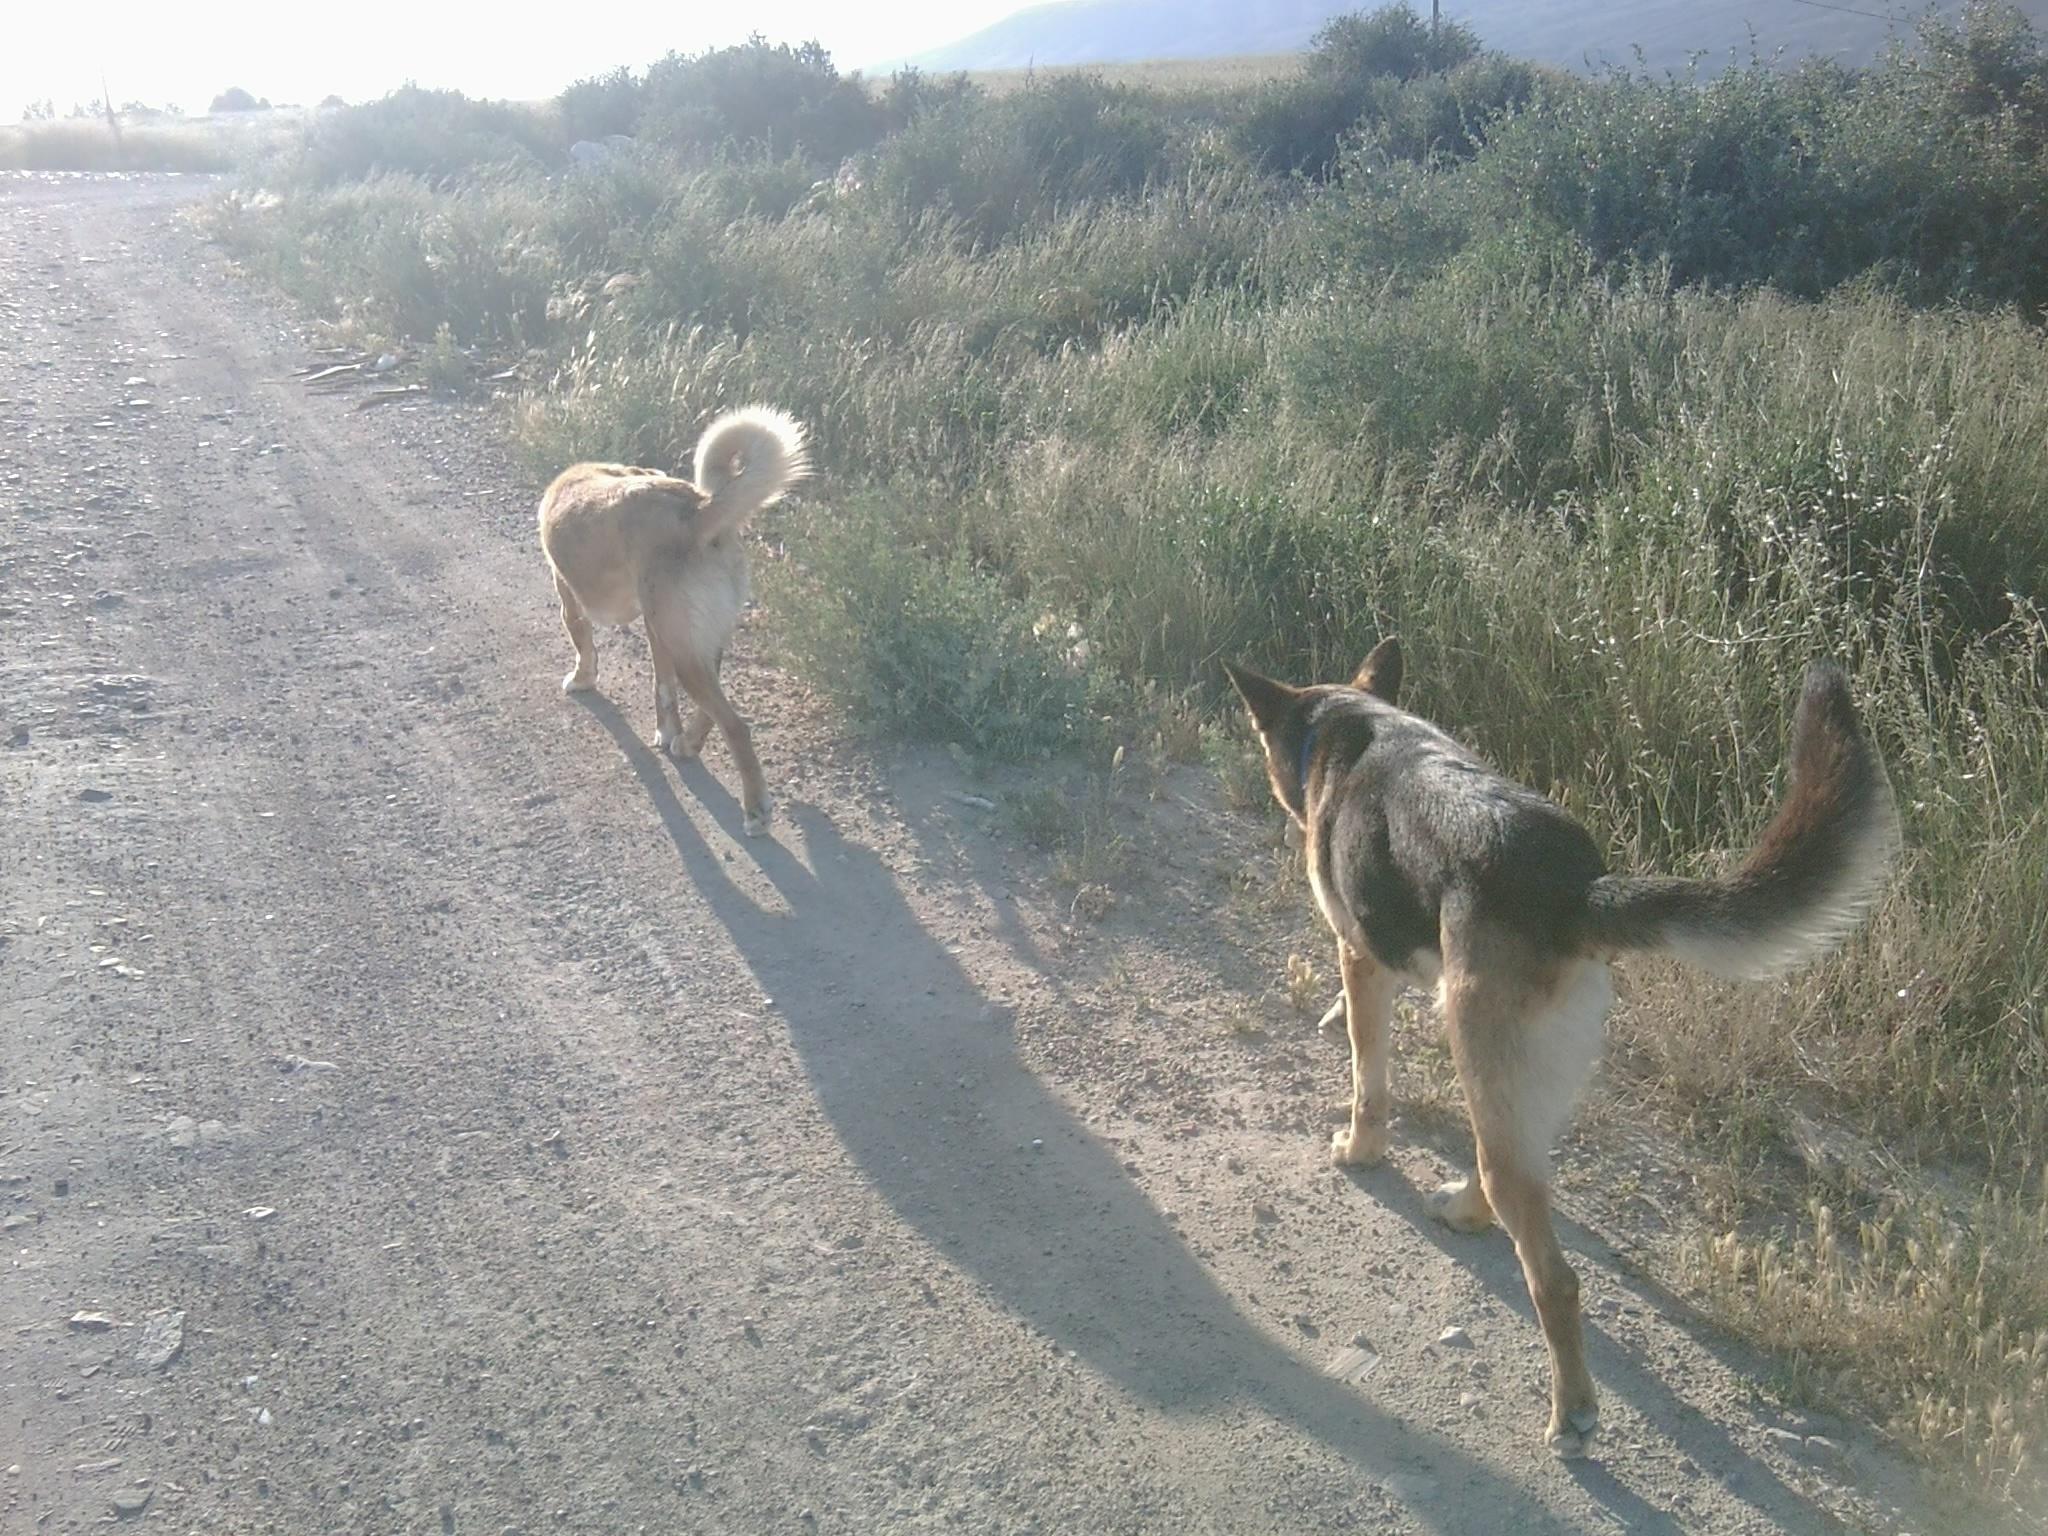 My Hunde